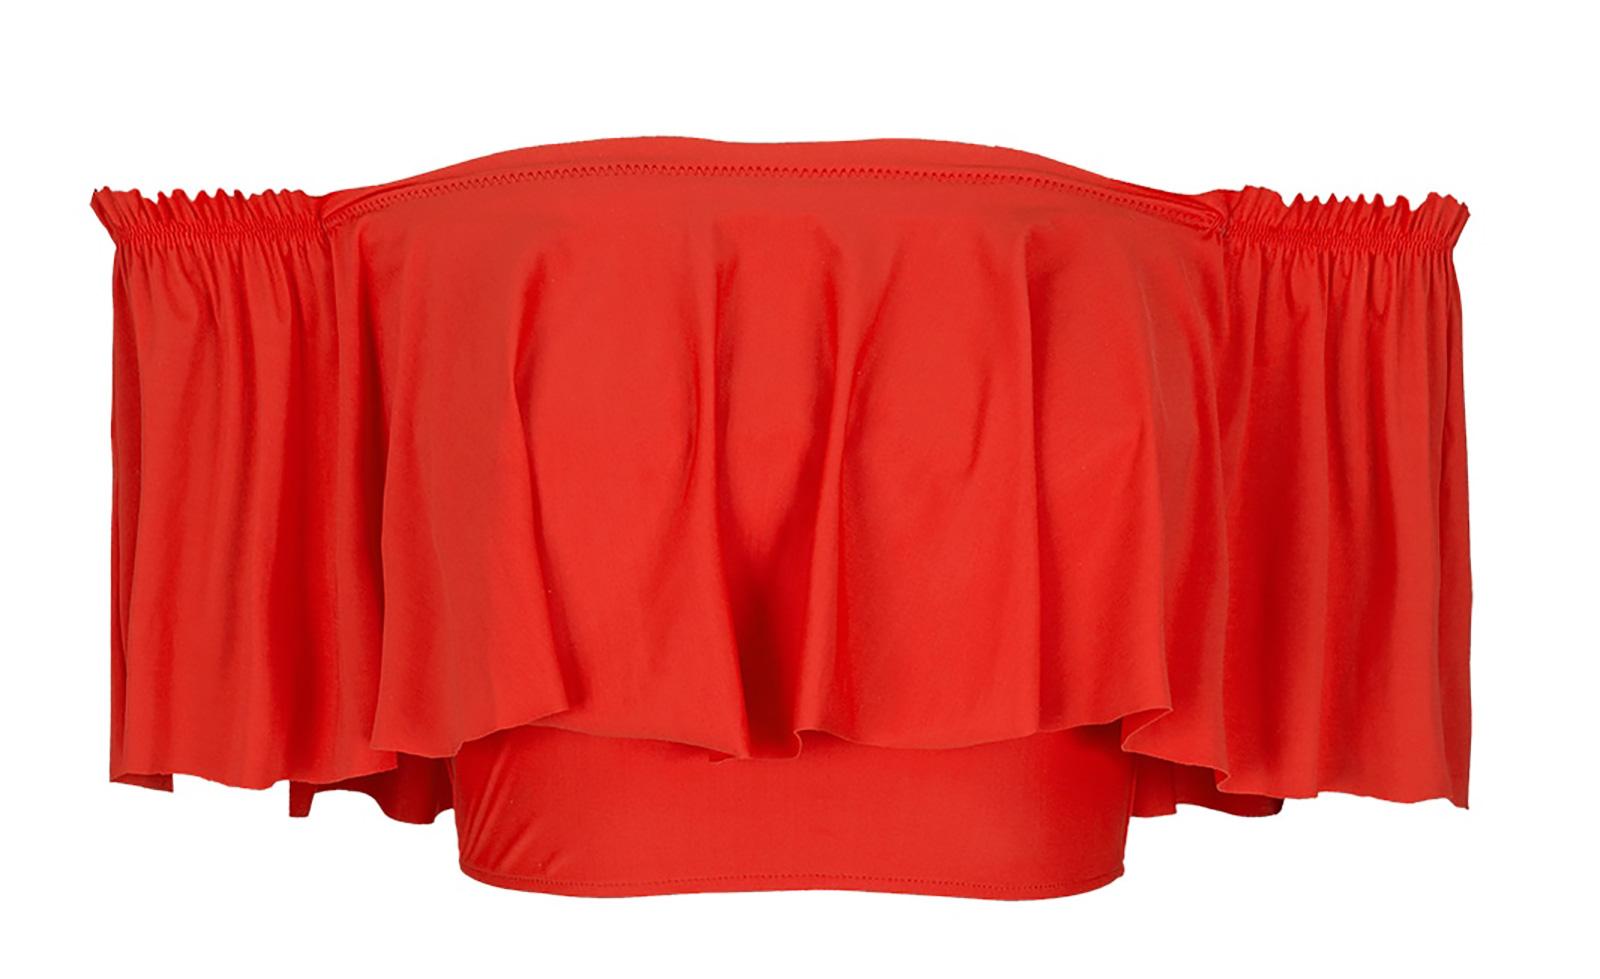 42169899f707f Orangey-red Bandeau Top With Wide Frills - Soutien Urucum Babado ...